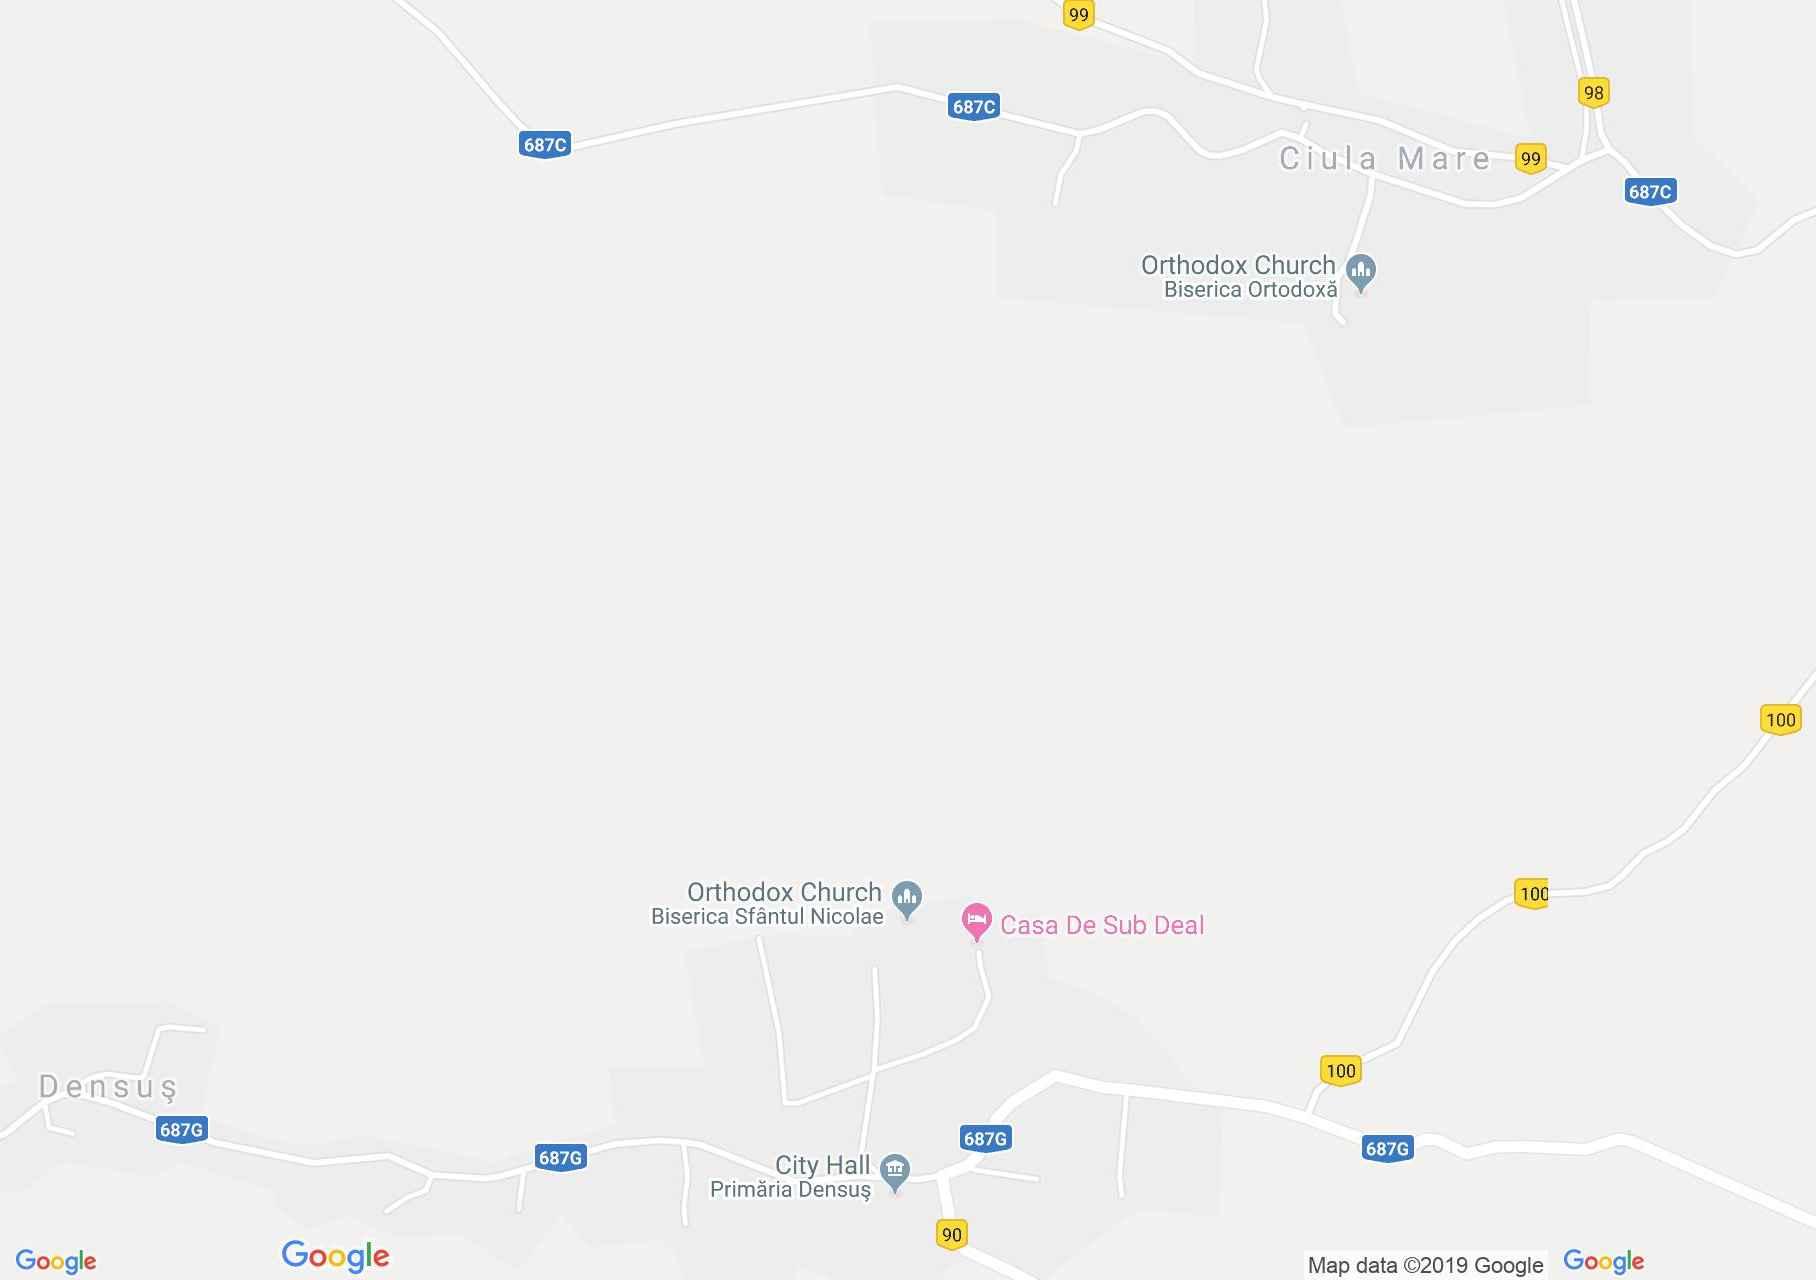 Demsus: Demsusi templom (térkép)